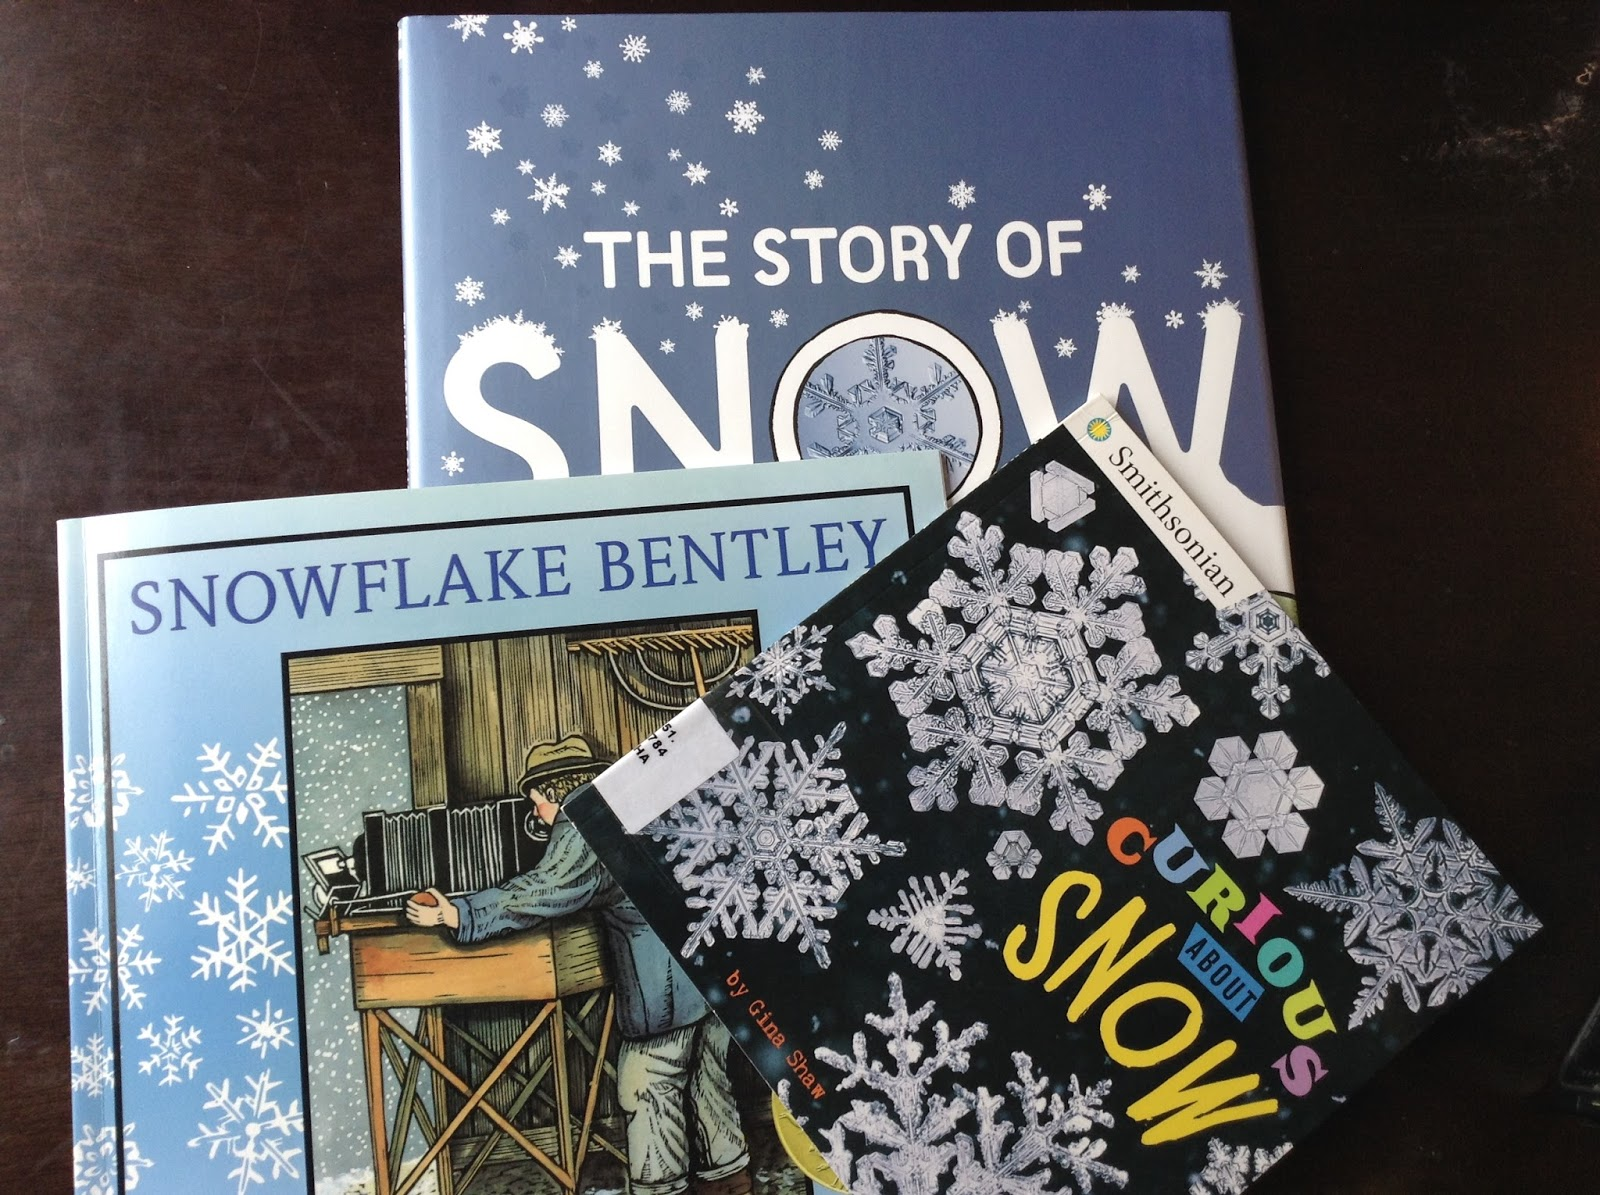 snowflake bentley snowflakeswilsonbentley by wikipedia circa book photos wiki wilson